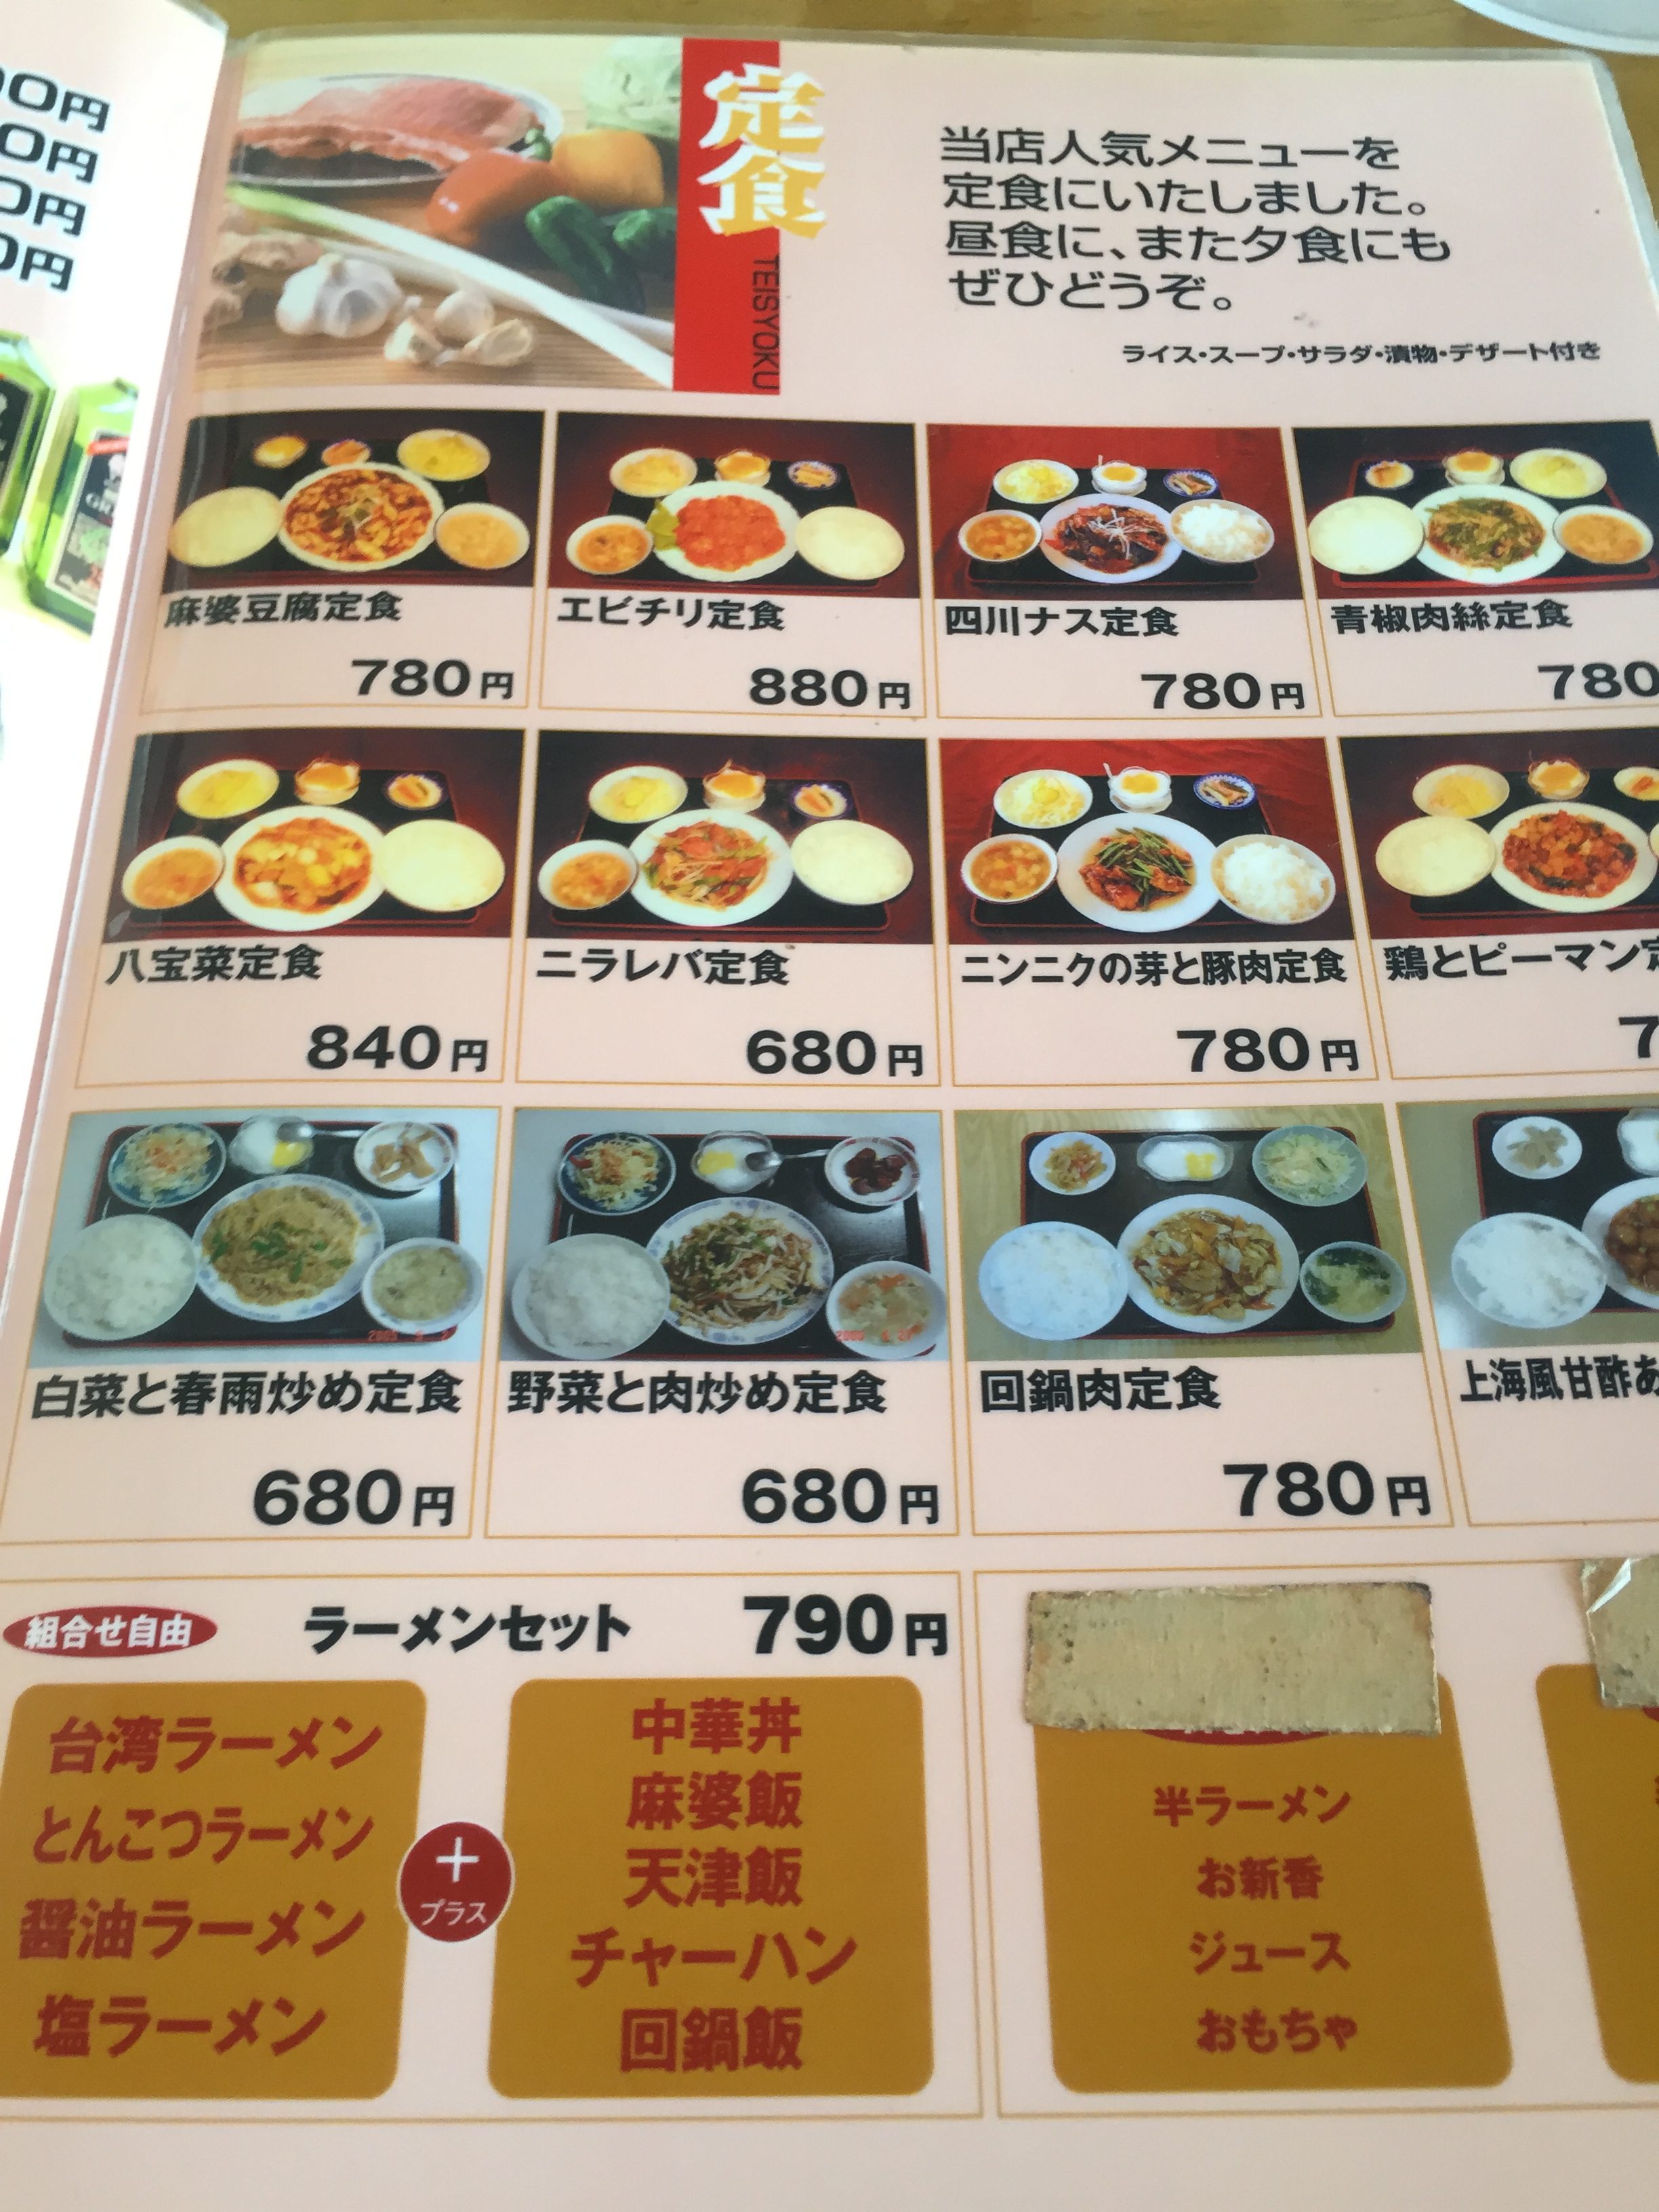 西安刀削麺 大河原店 メニュー2